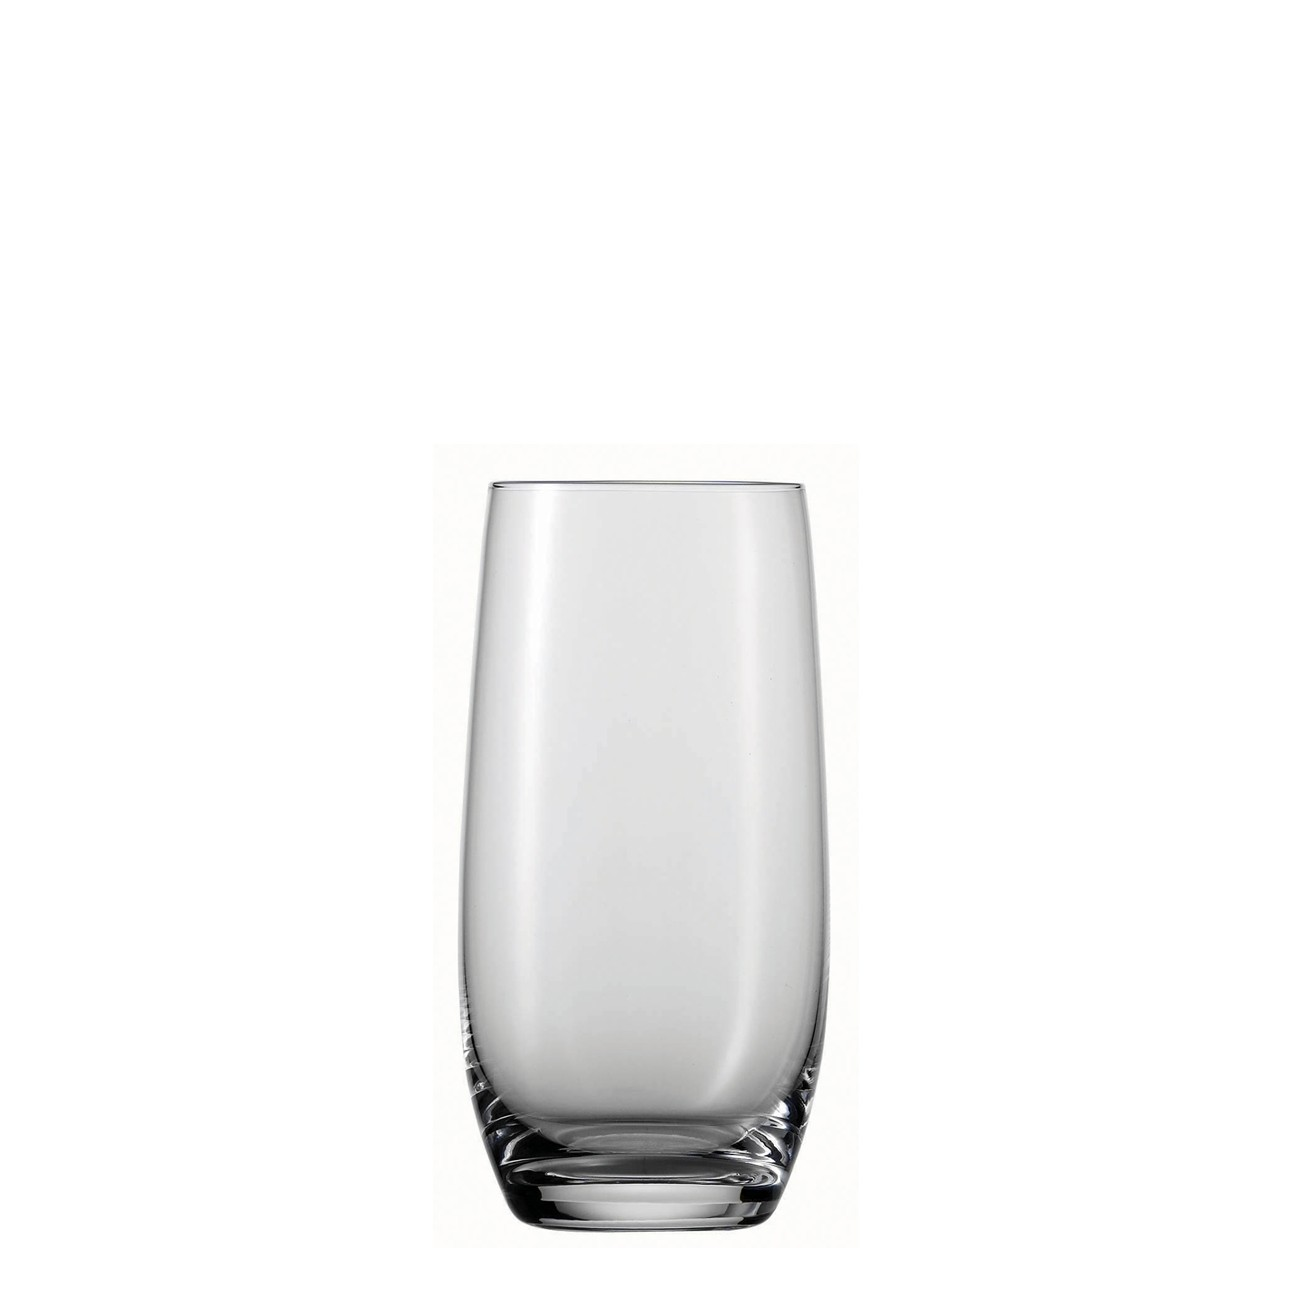 Schott Zwiesel Tritan Crystal, Banquet Iced Beverage, Single